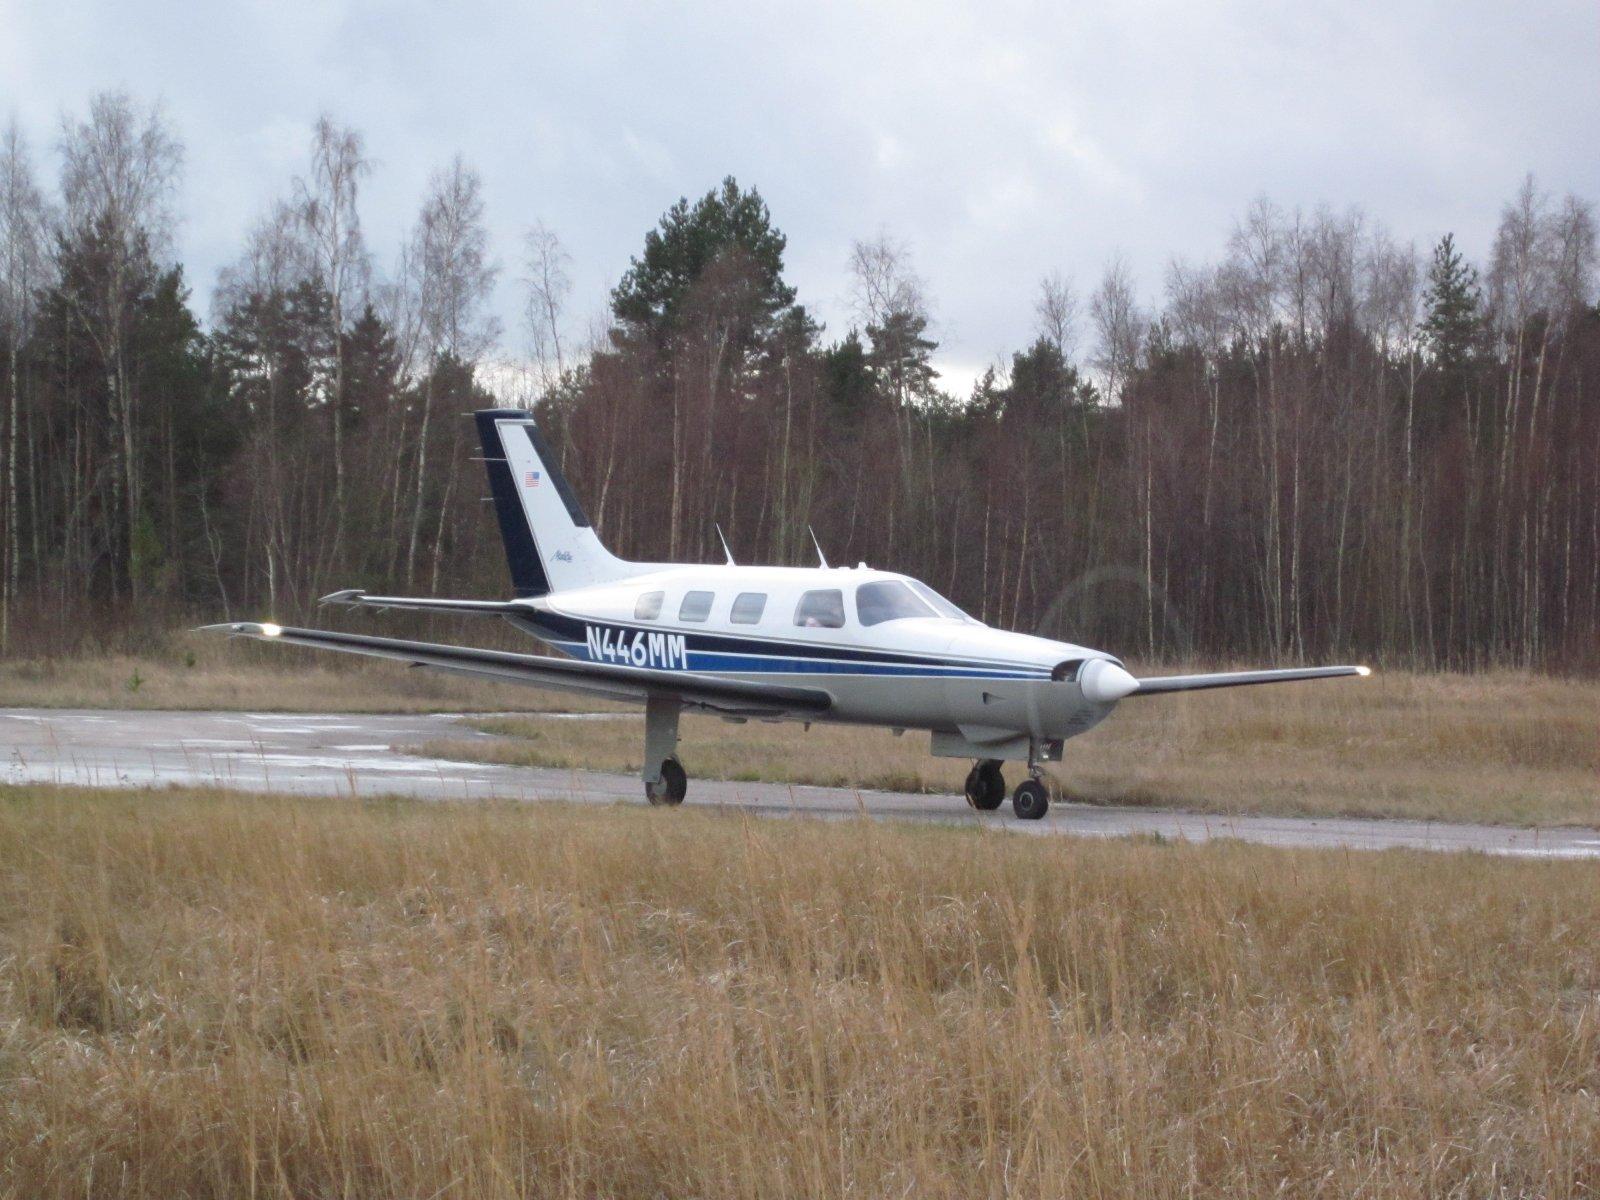 Piper PA-46-310P Malibu N446MM EFHN 2011-12-31